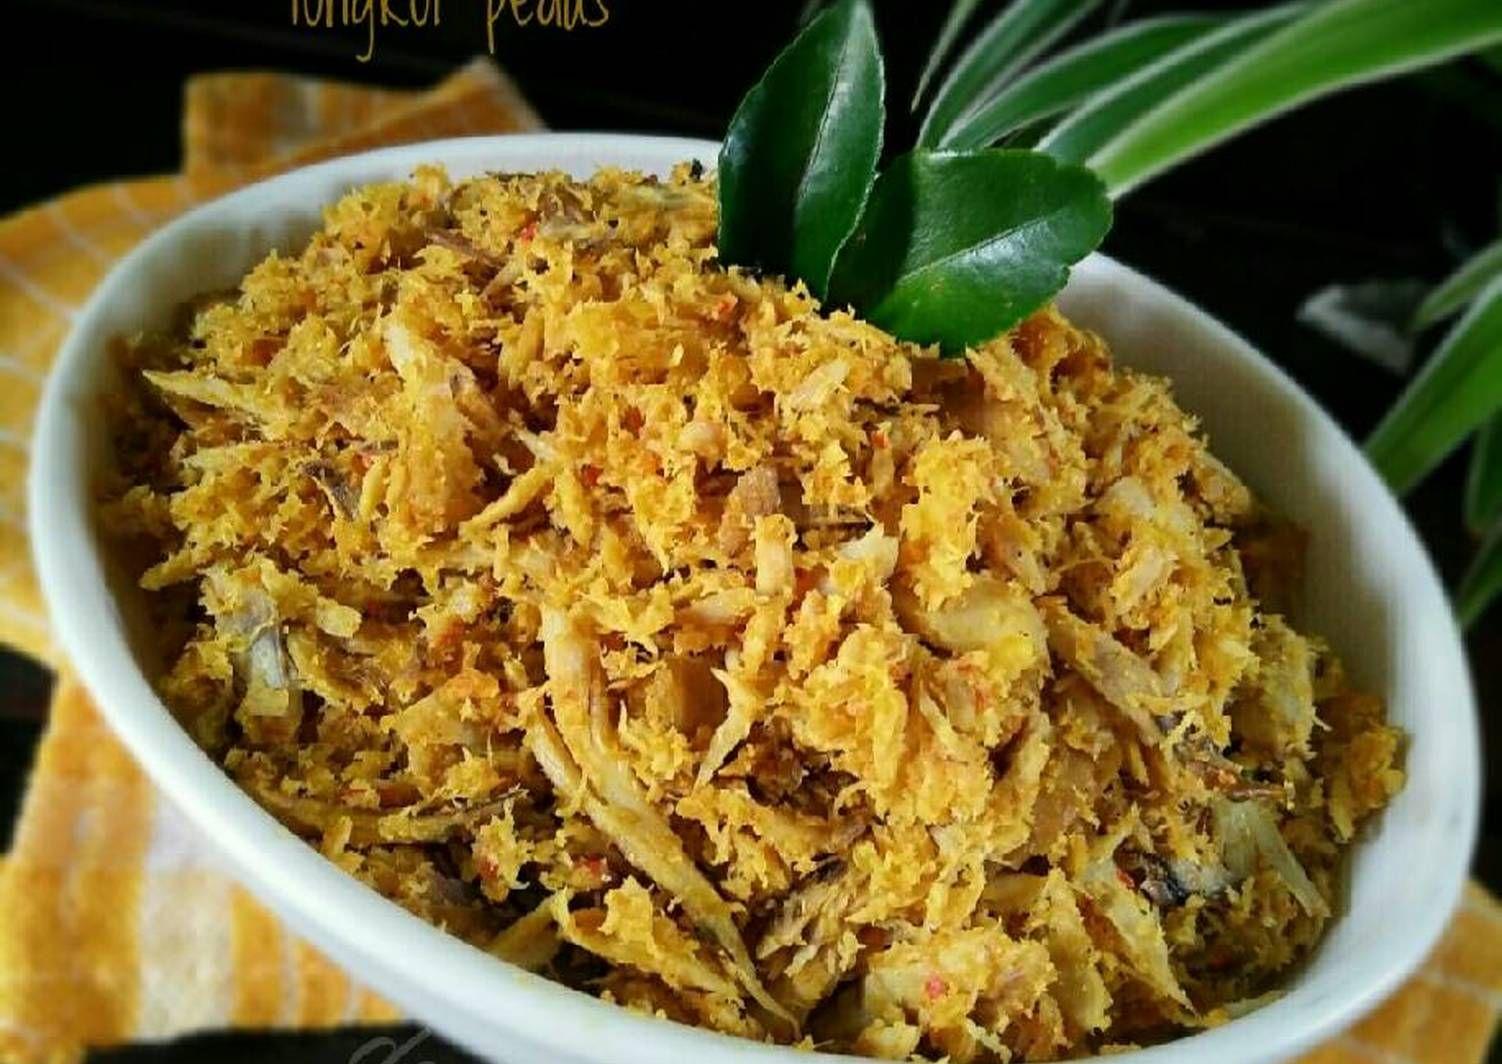 Resep Serundeng Tongkol Pedas Oleh Dapurvy Resep Resep Resep Masakan Asia Resep Masakan Indonesia